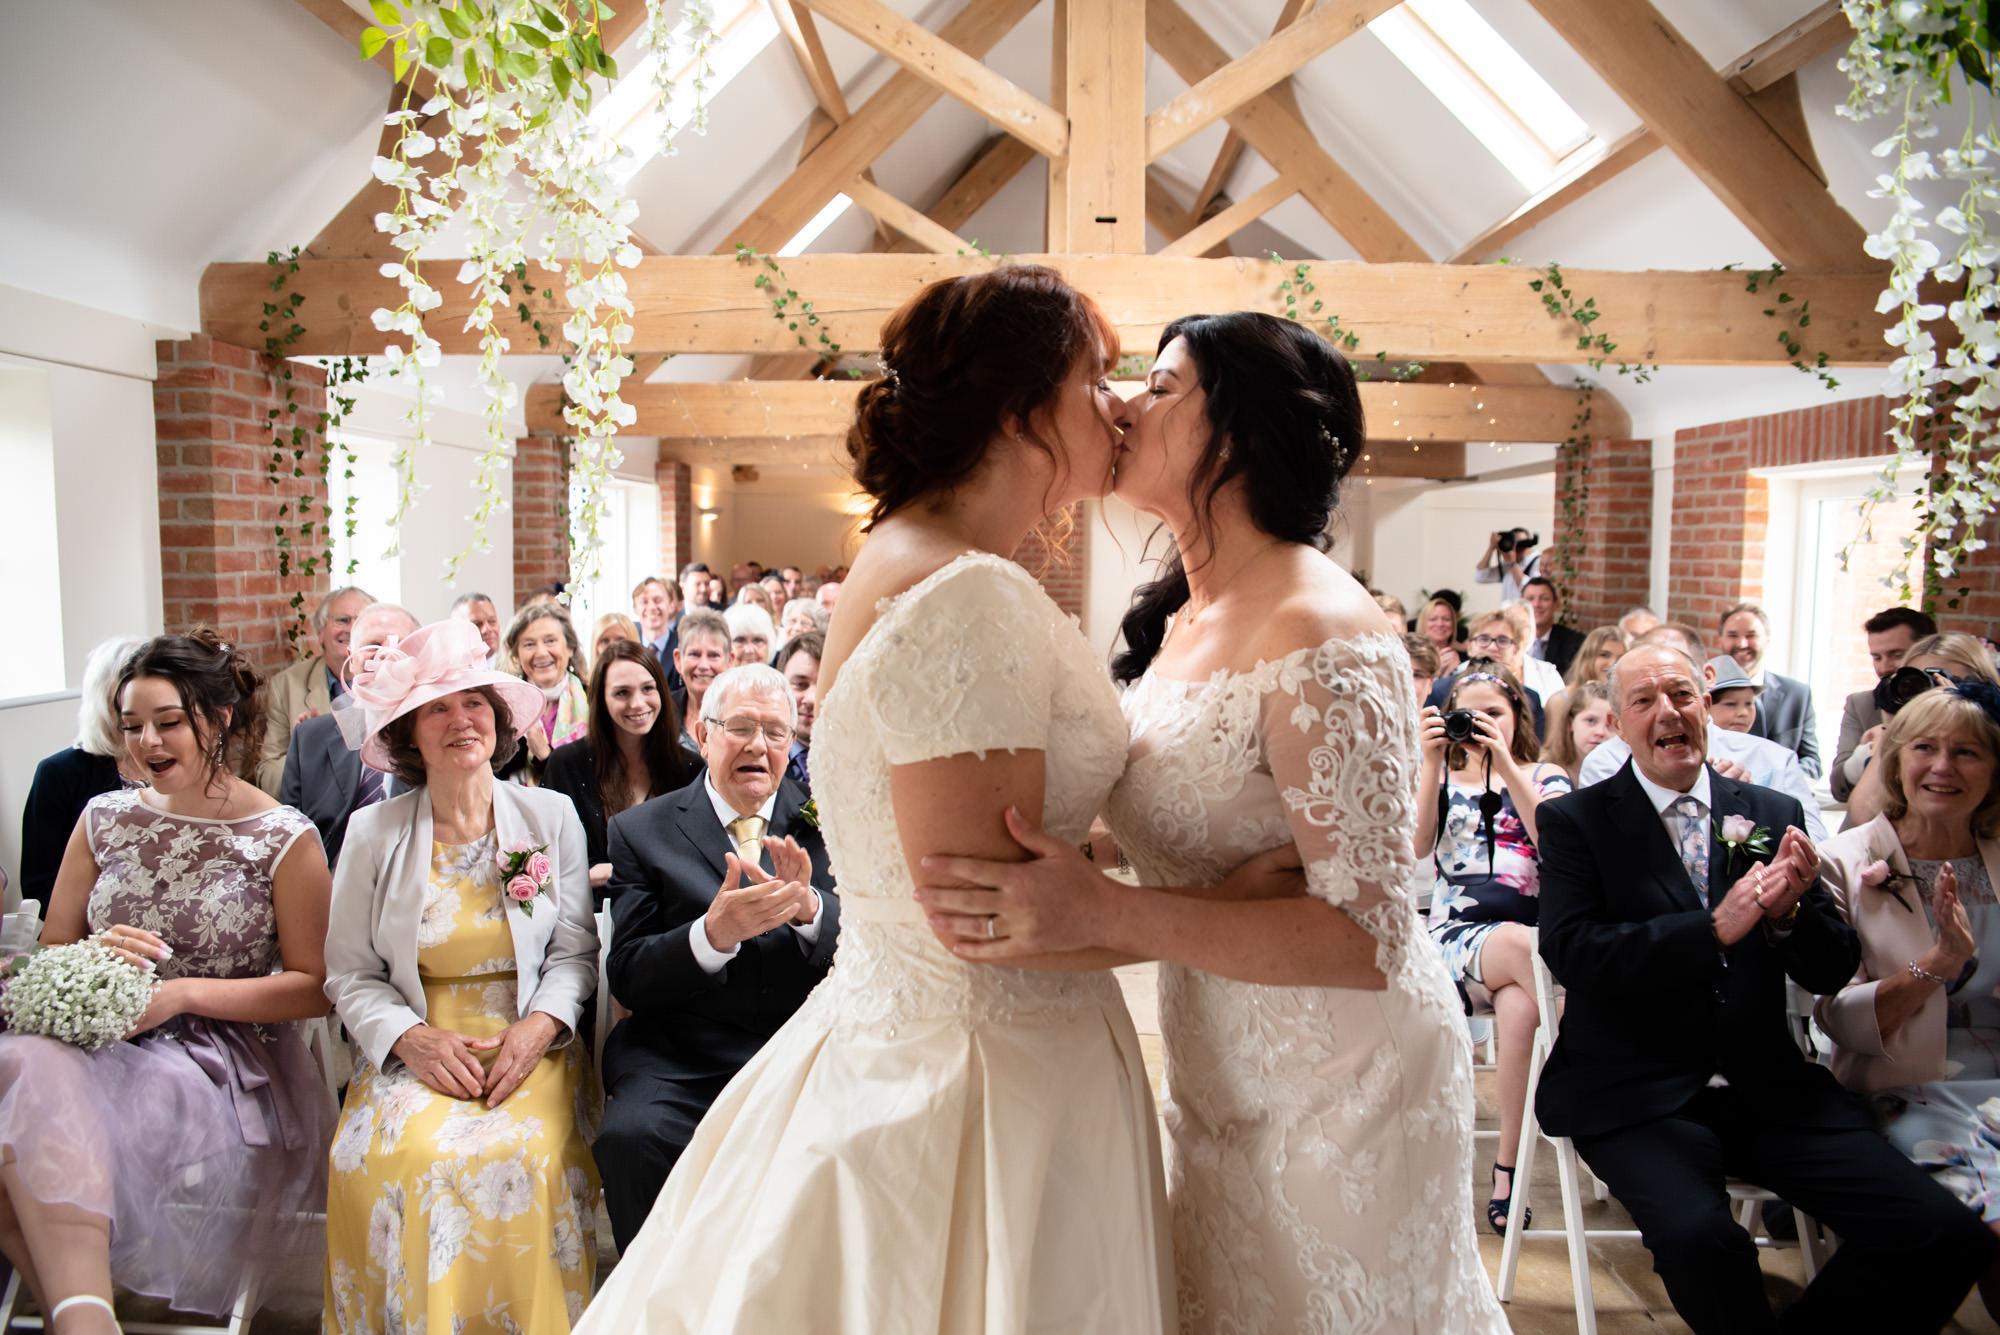 First Kiss at Hanbury Wedding BArn